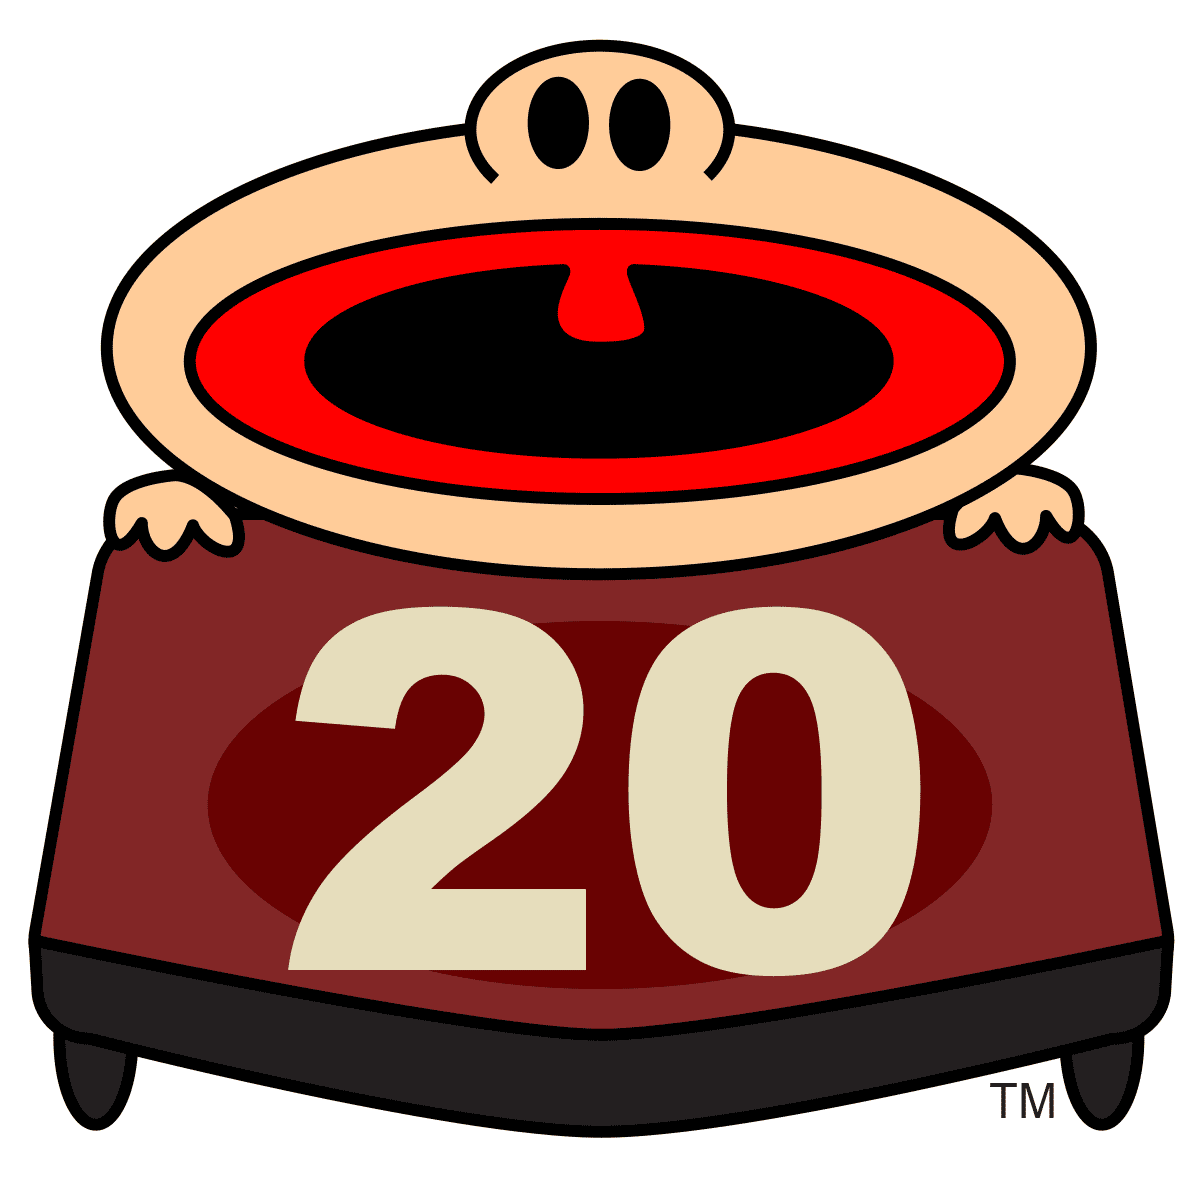 CoasterBuzz 20